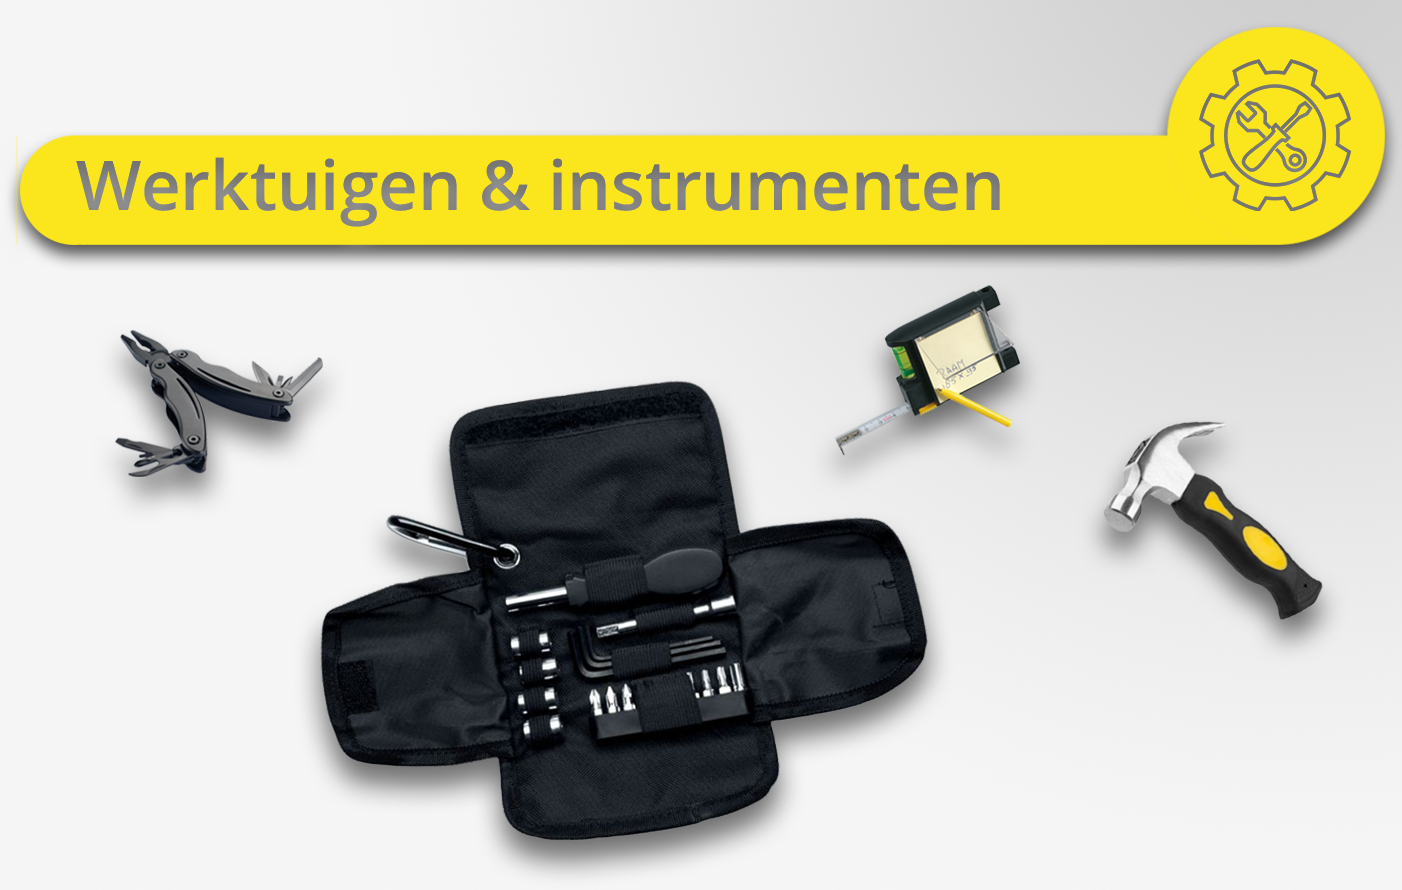 Werktuigen & instrumenten